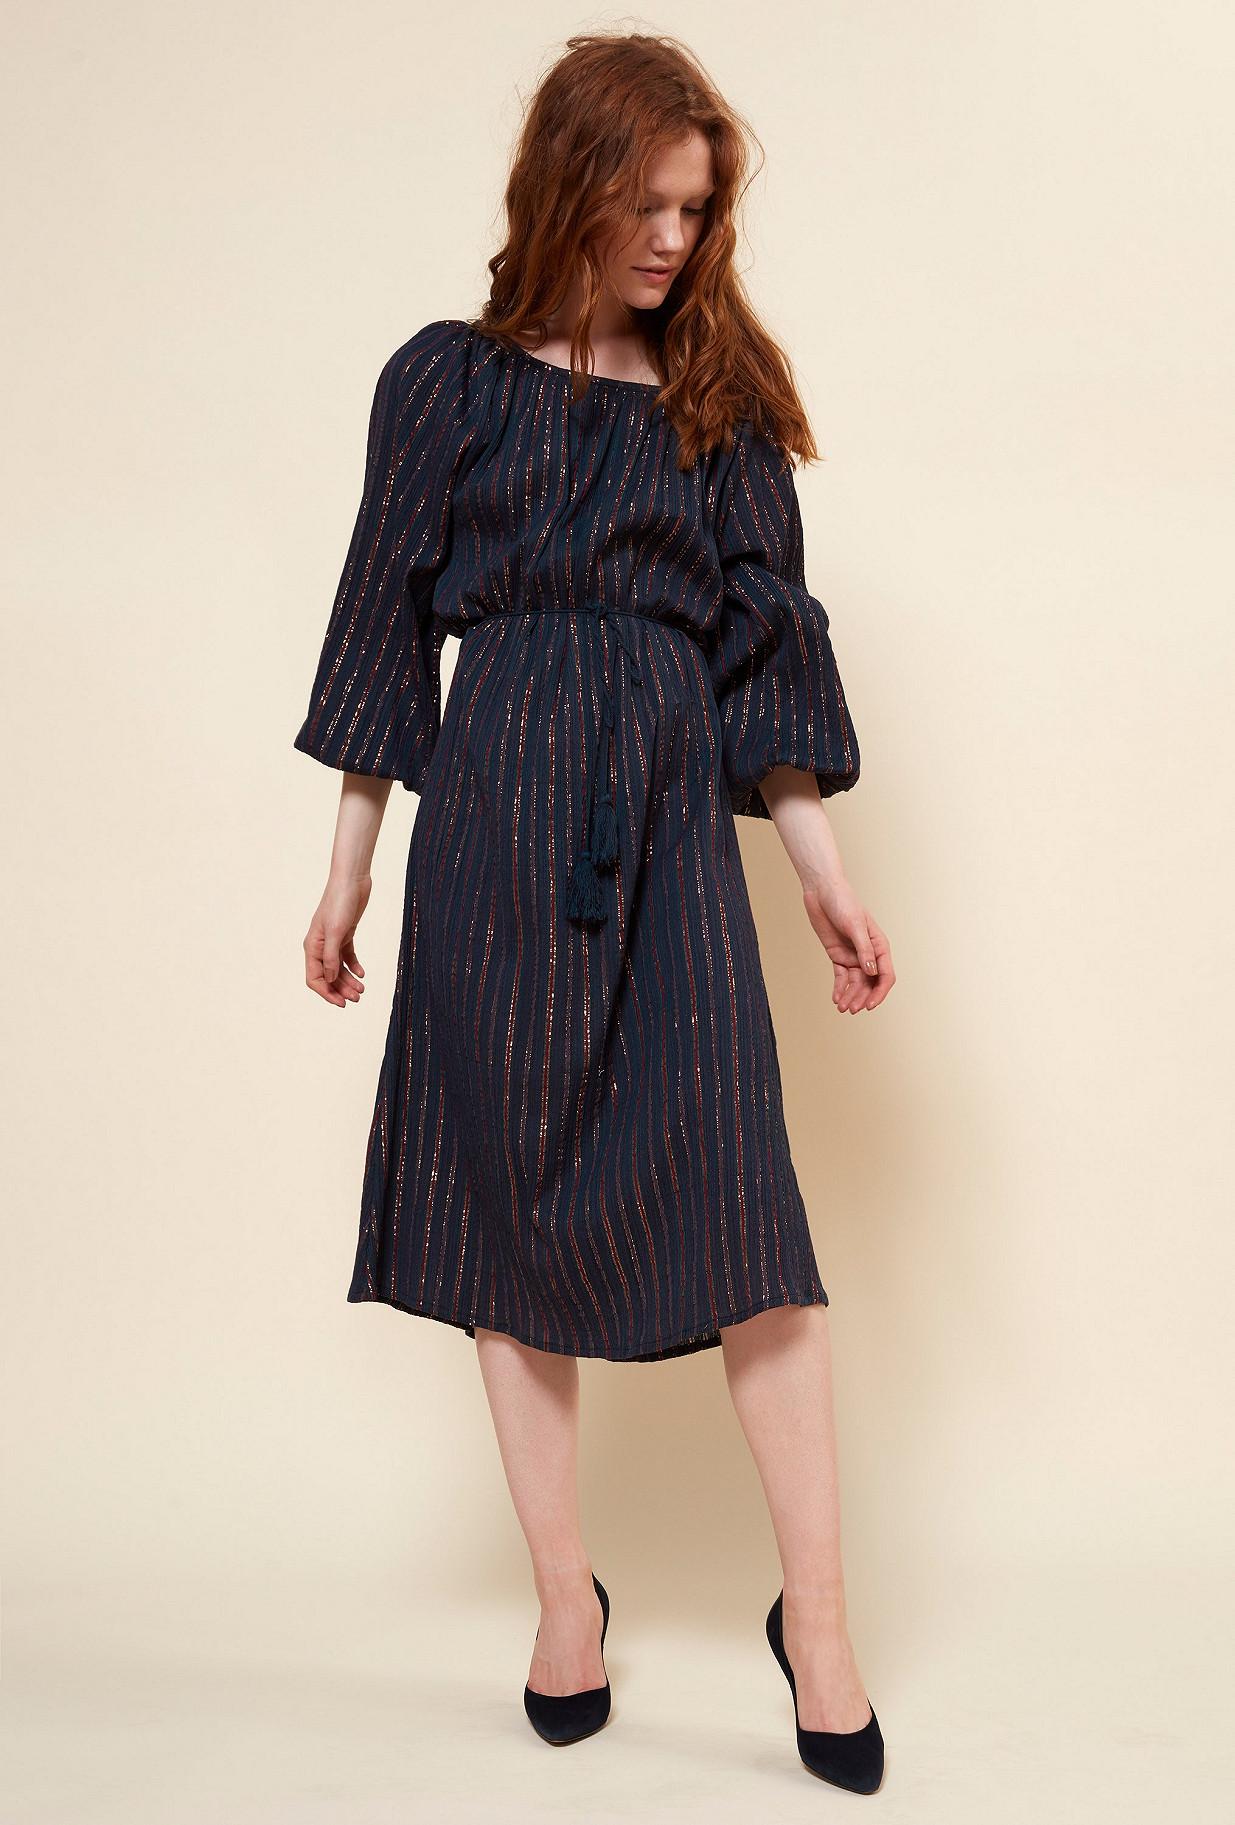 boutique de vetement Robe createur boheme  Esmeralda